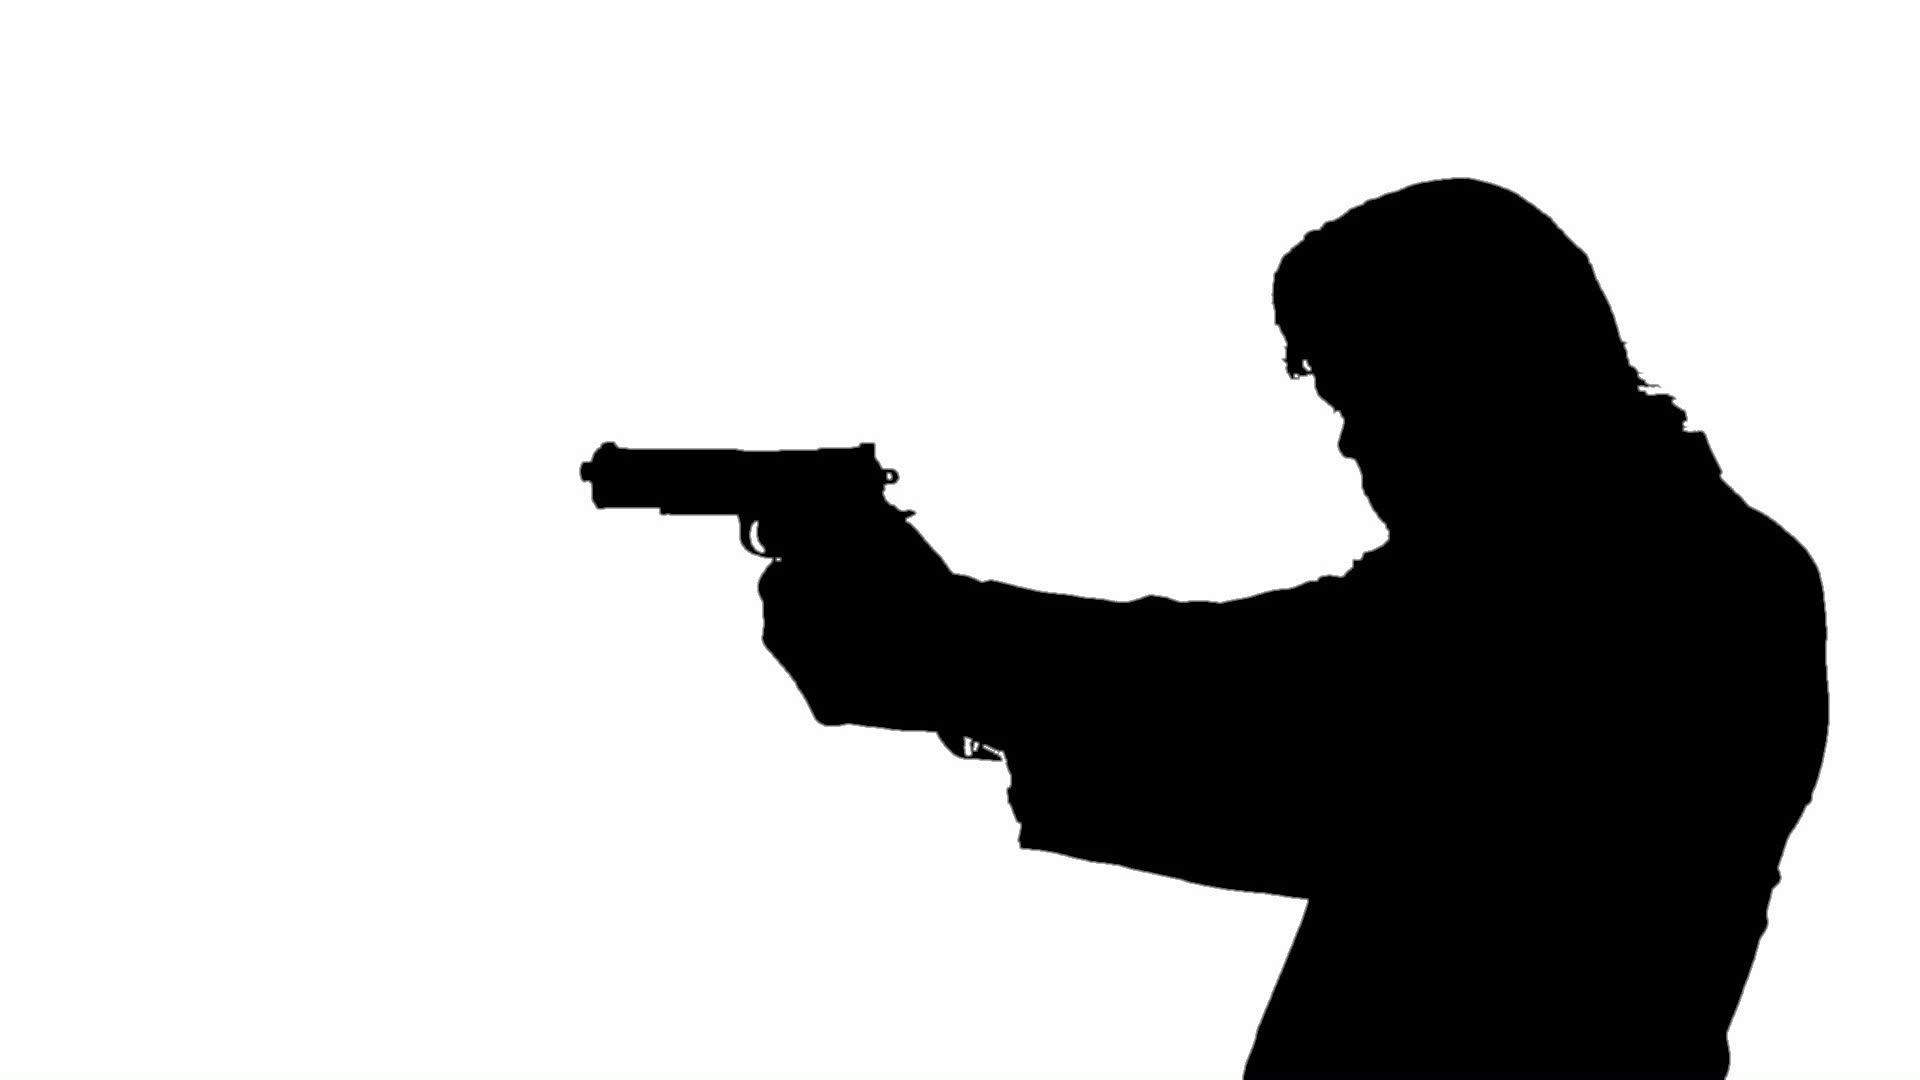 Jaw Prison inmate accidentally shot by terrorist during jailbreak